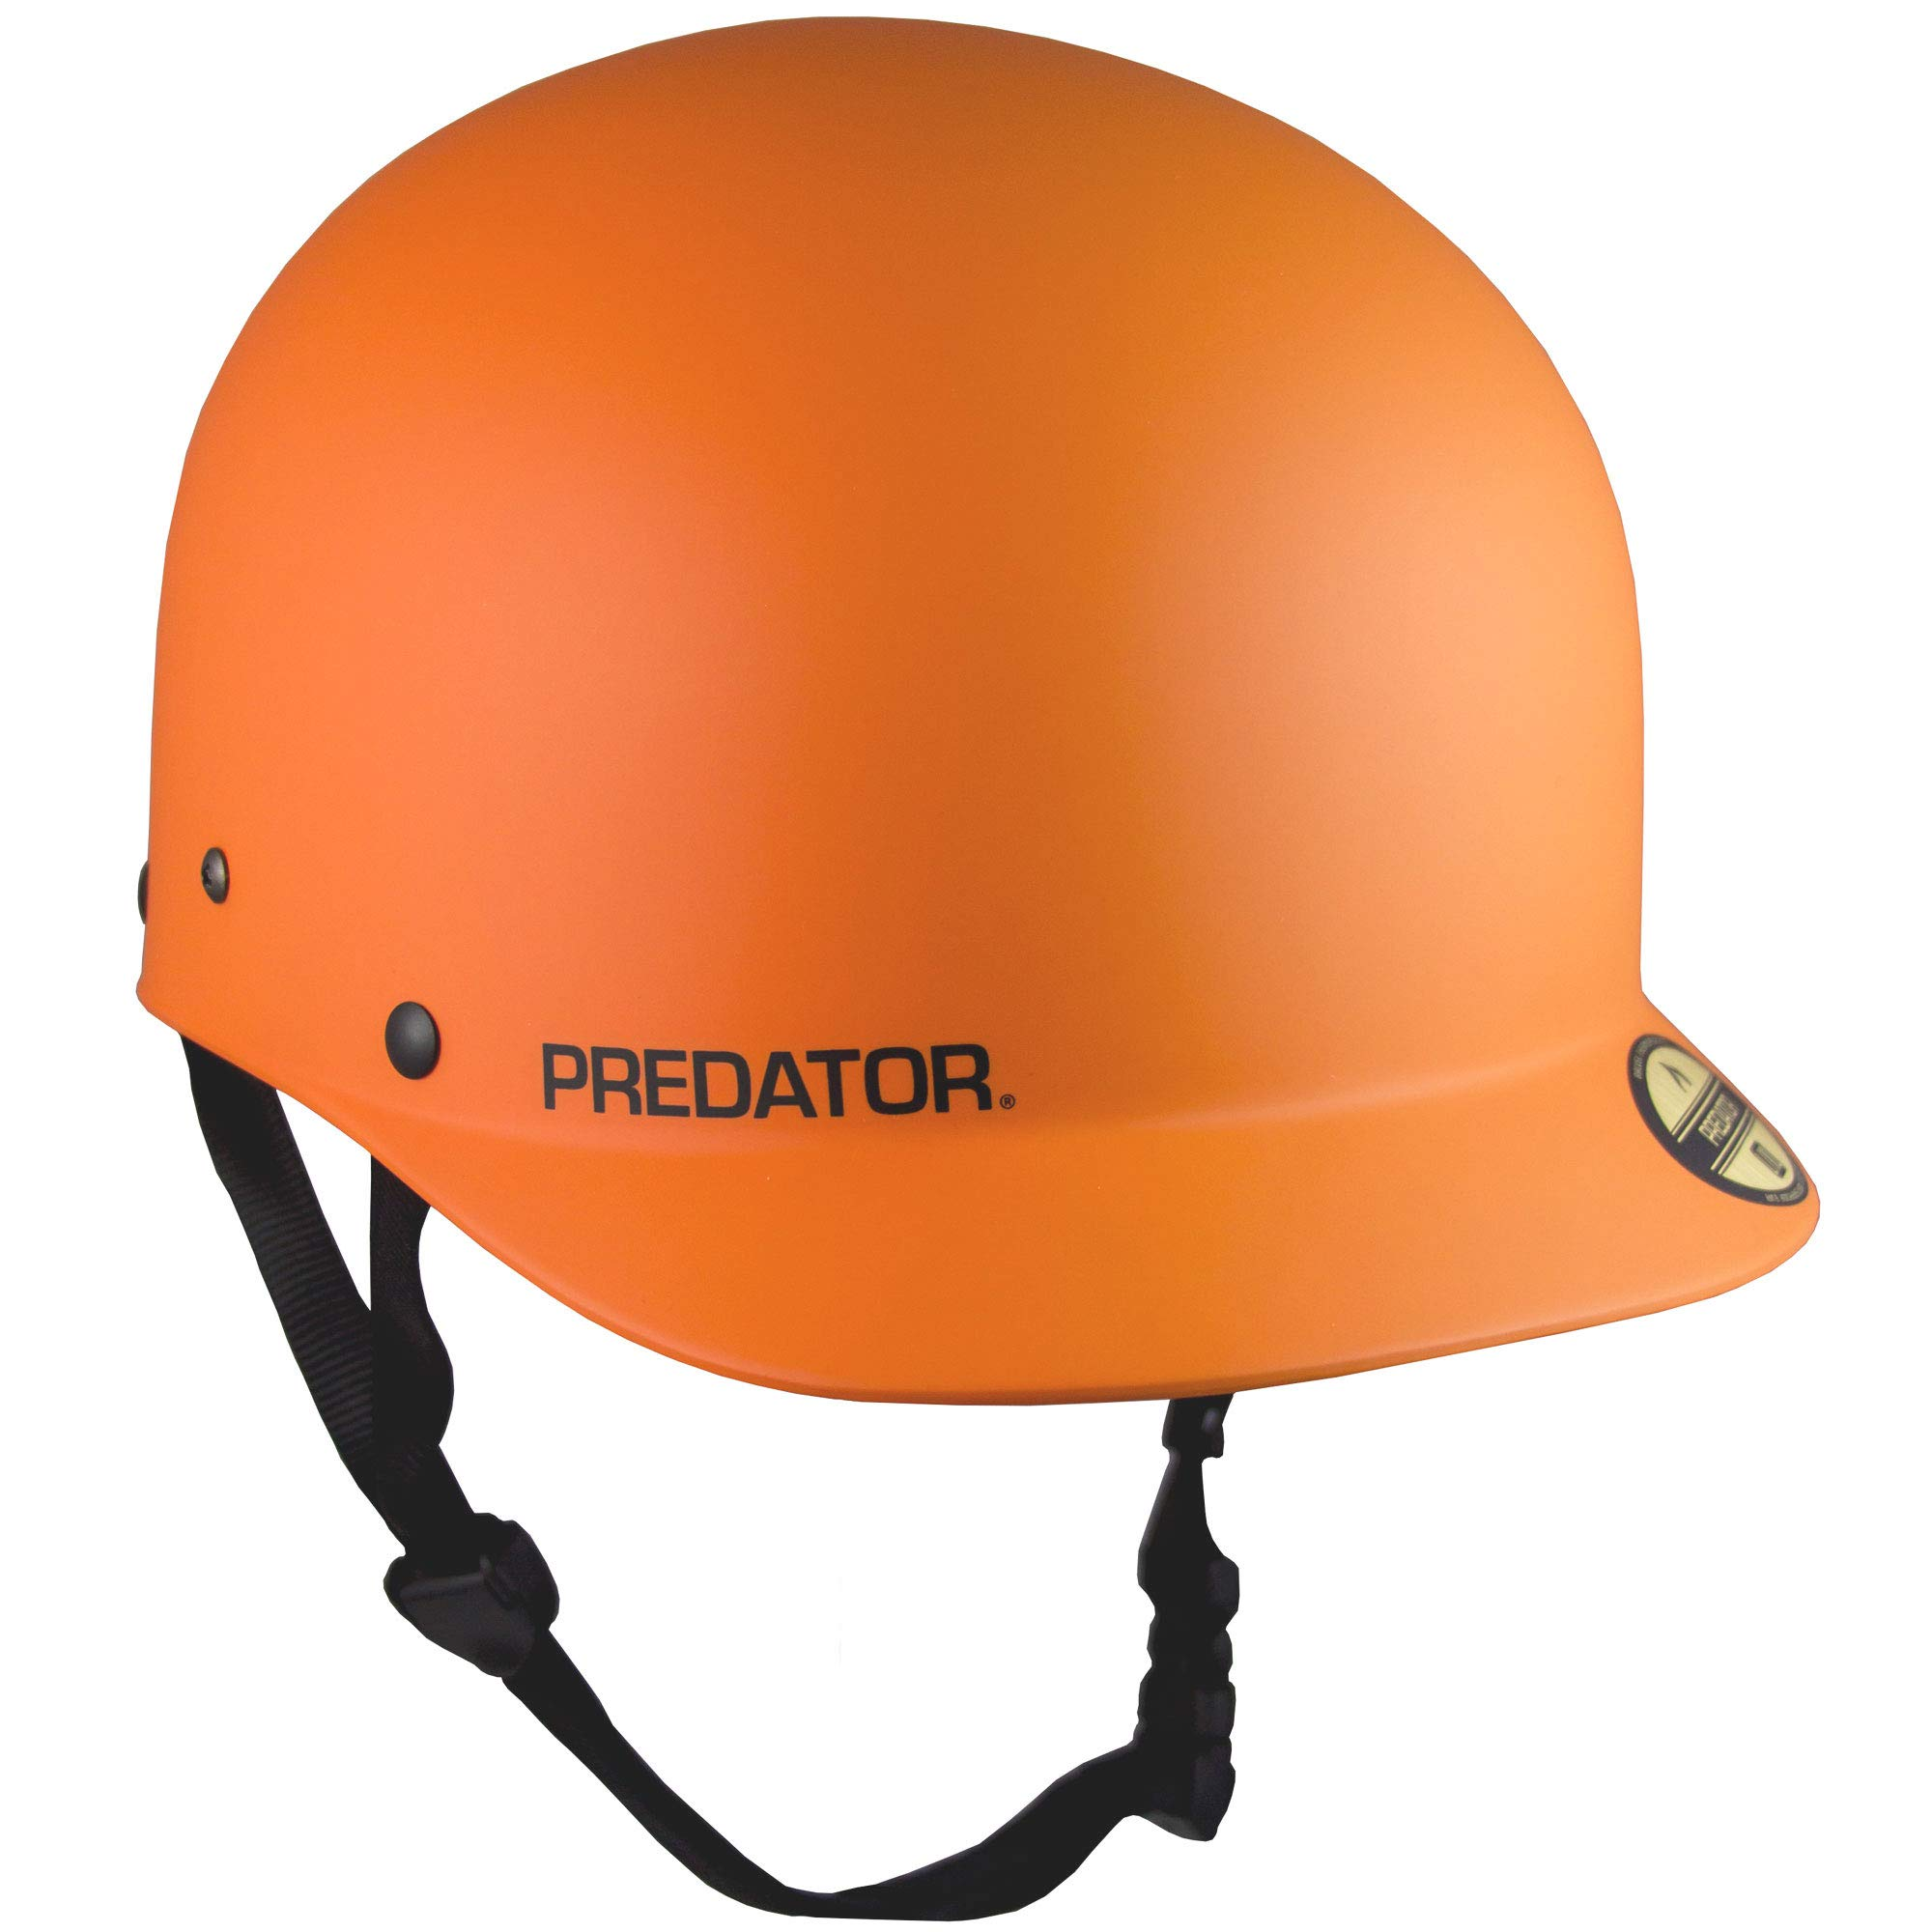 Predator Shiznit Kayak Helmet-MatteOrange-L/XL by Predator